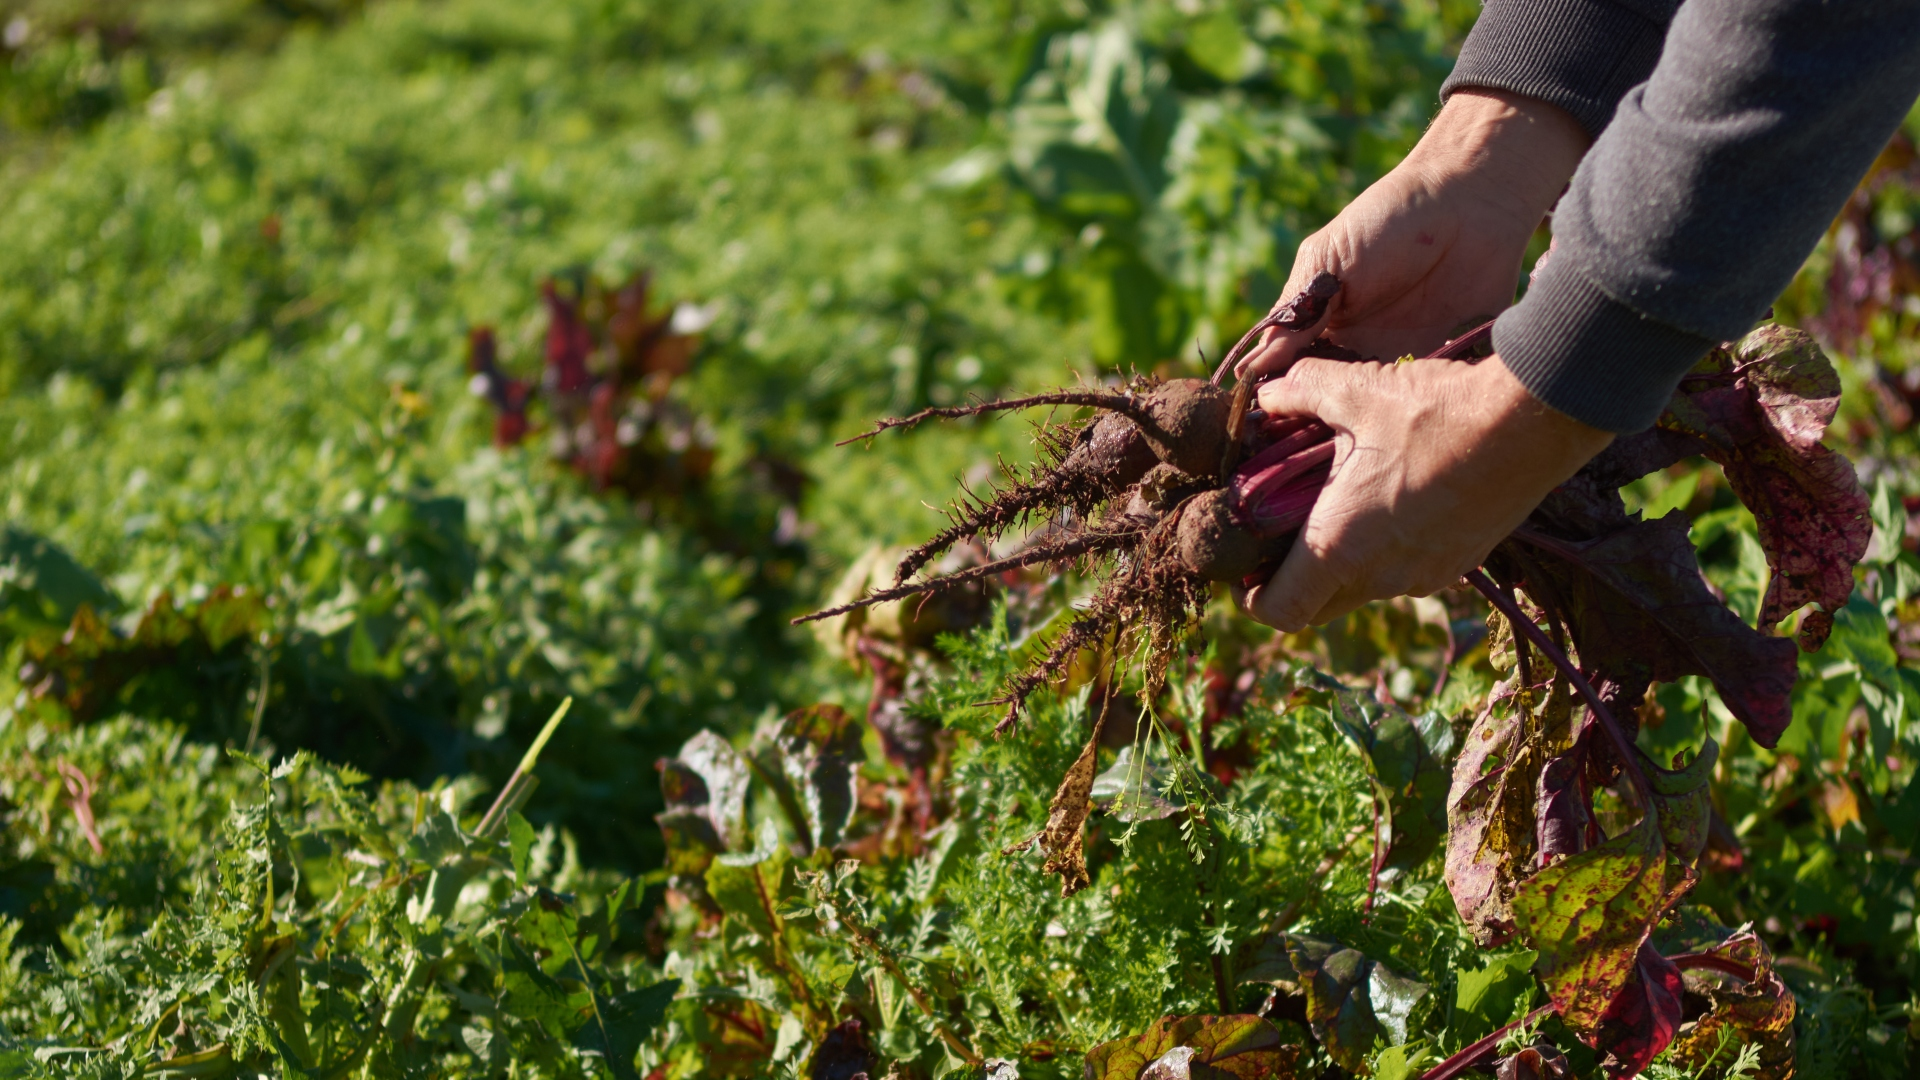 El Programa Huerta Familiar Santafesina permitió producir toneladas de alimentos saludables